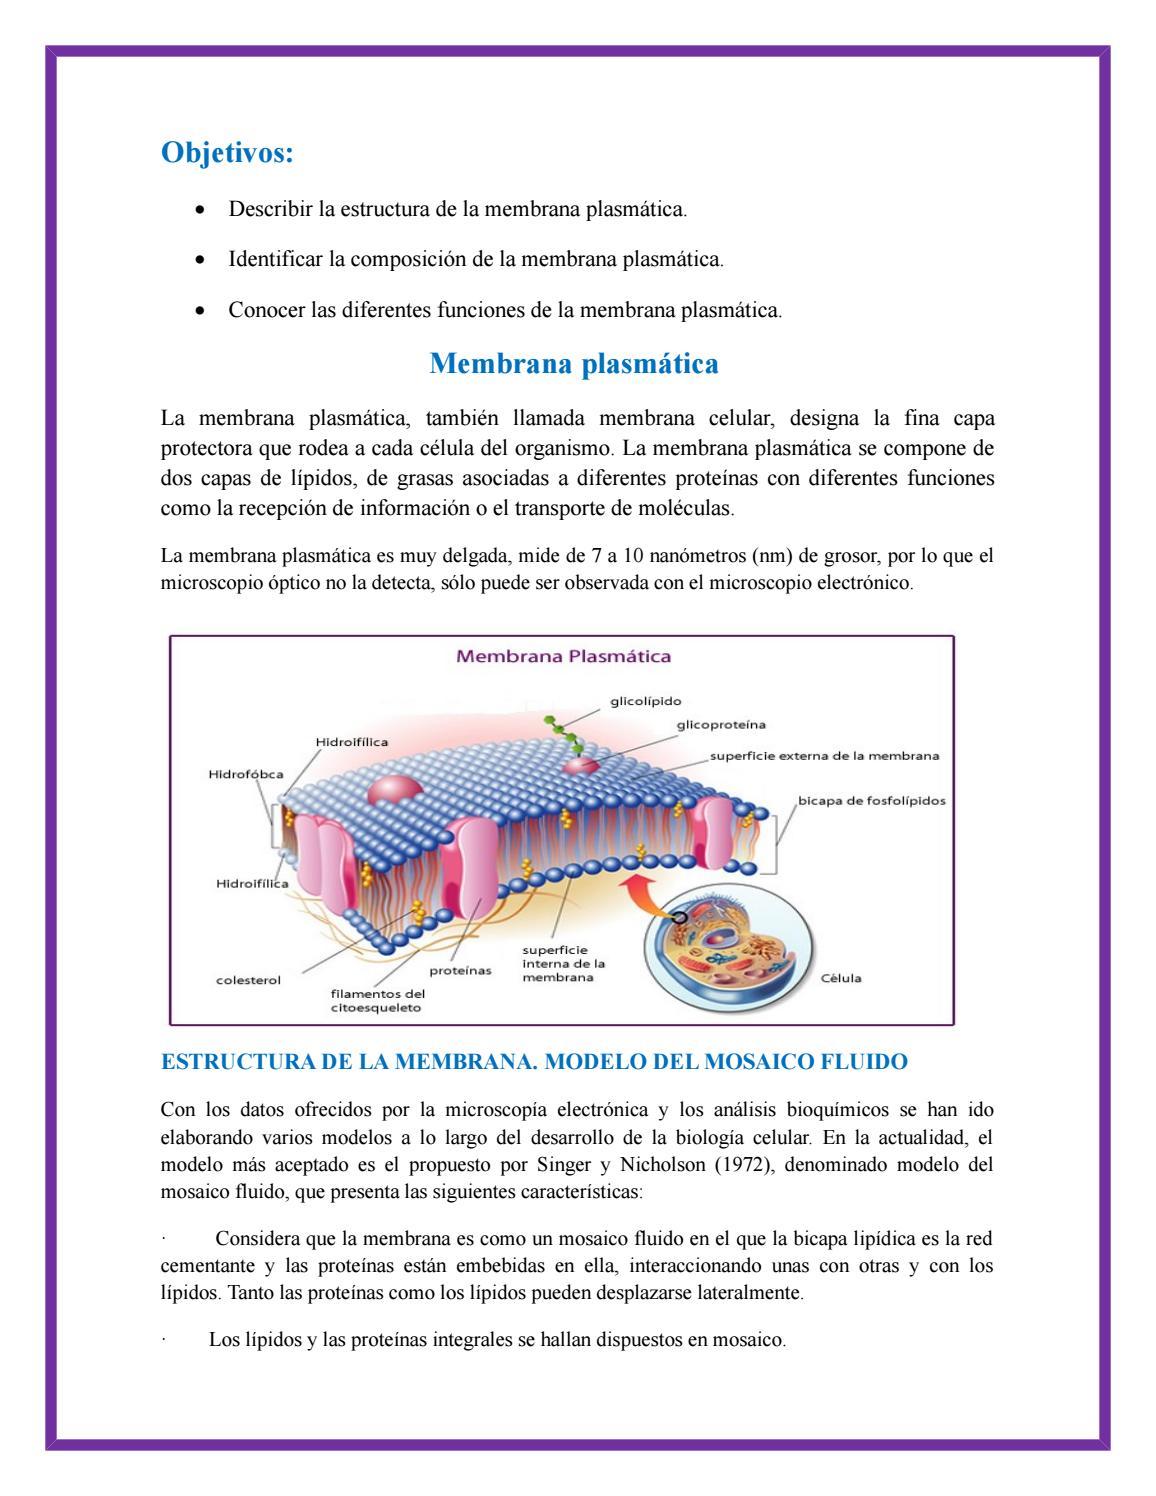 Membrana Plasmatica By Señor Enfermerock Issuu